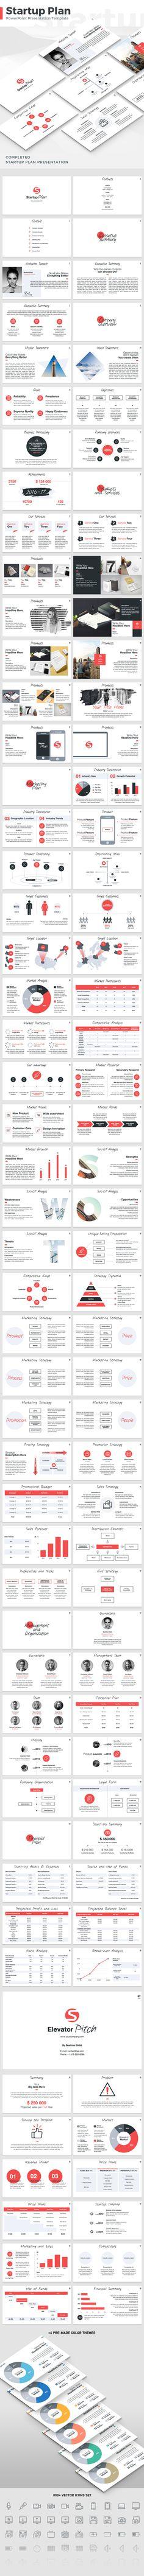 Startup Plan - PowerPoint Template